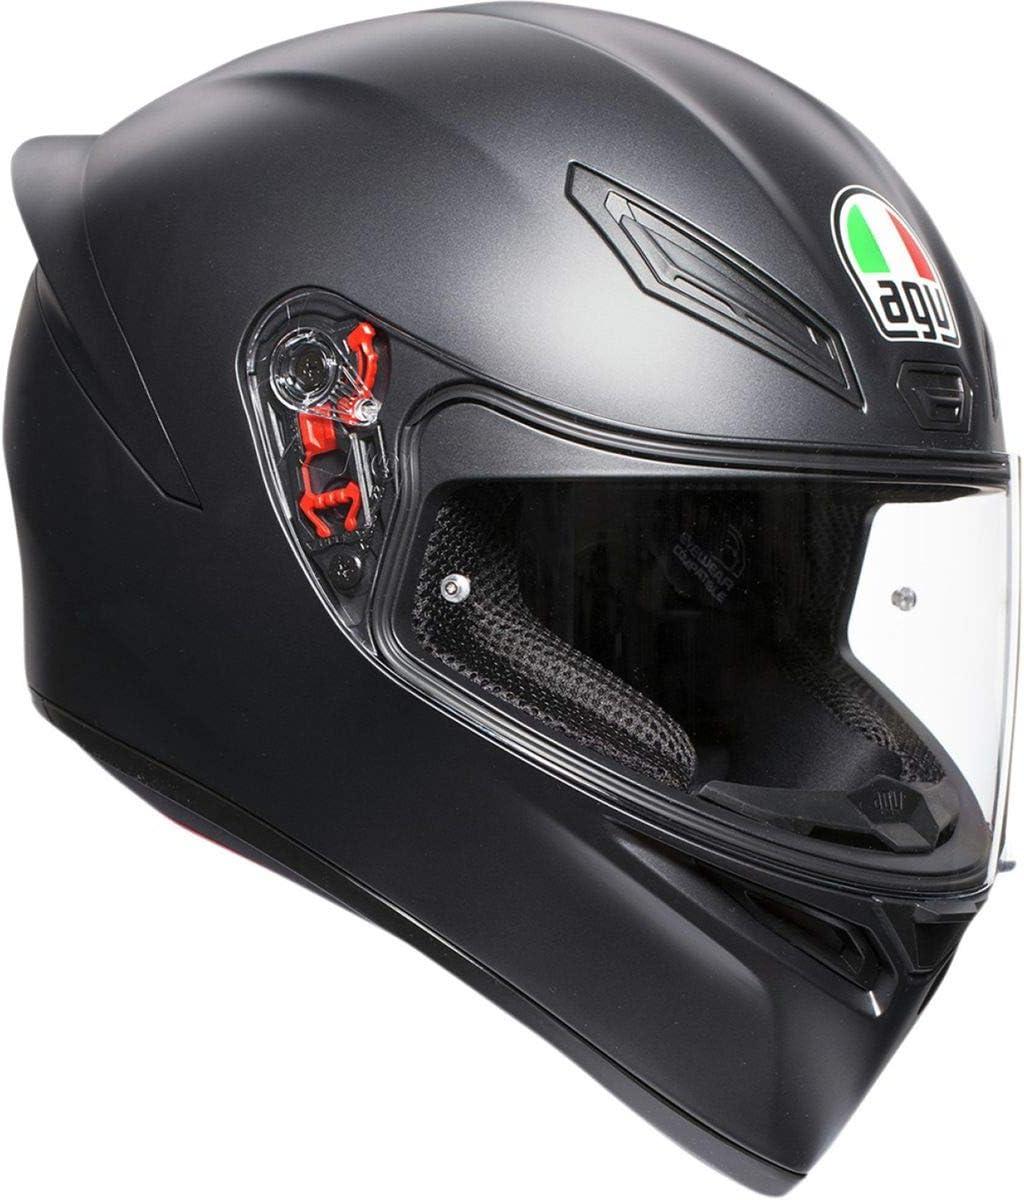 Unisex-Adult Full Face K-1 Motorcycle Helmet